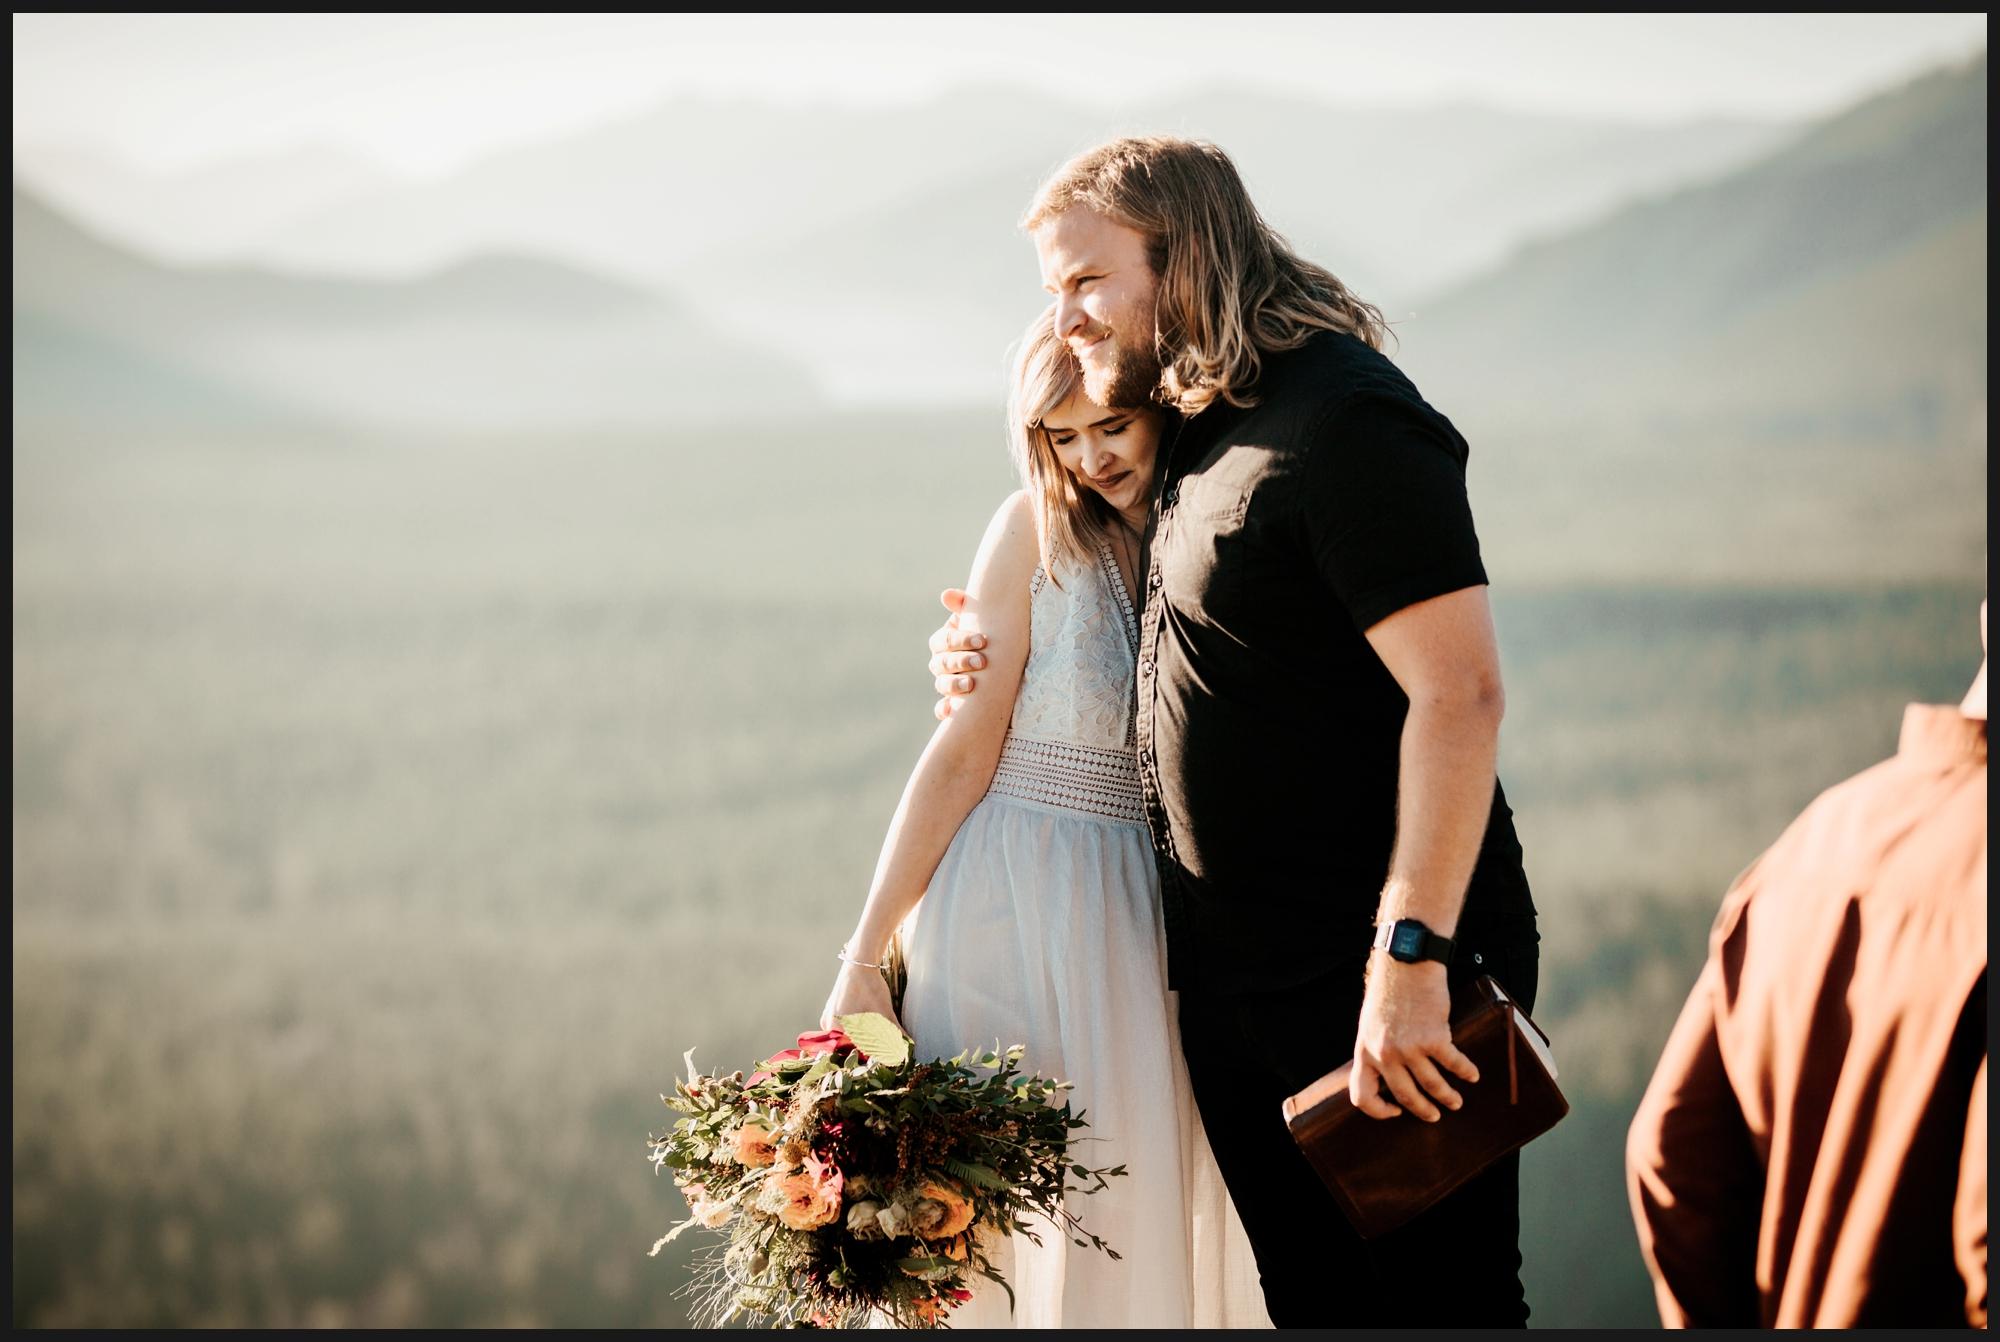 Orlando-Wedding-Photographer-destination-wedding-photographer-florida-wedding-photographer-bohemian-wedding-photographer_0458.jpg